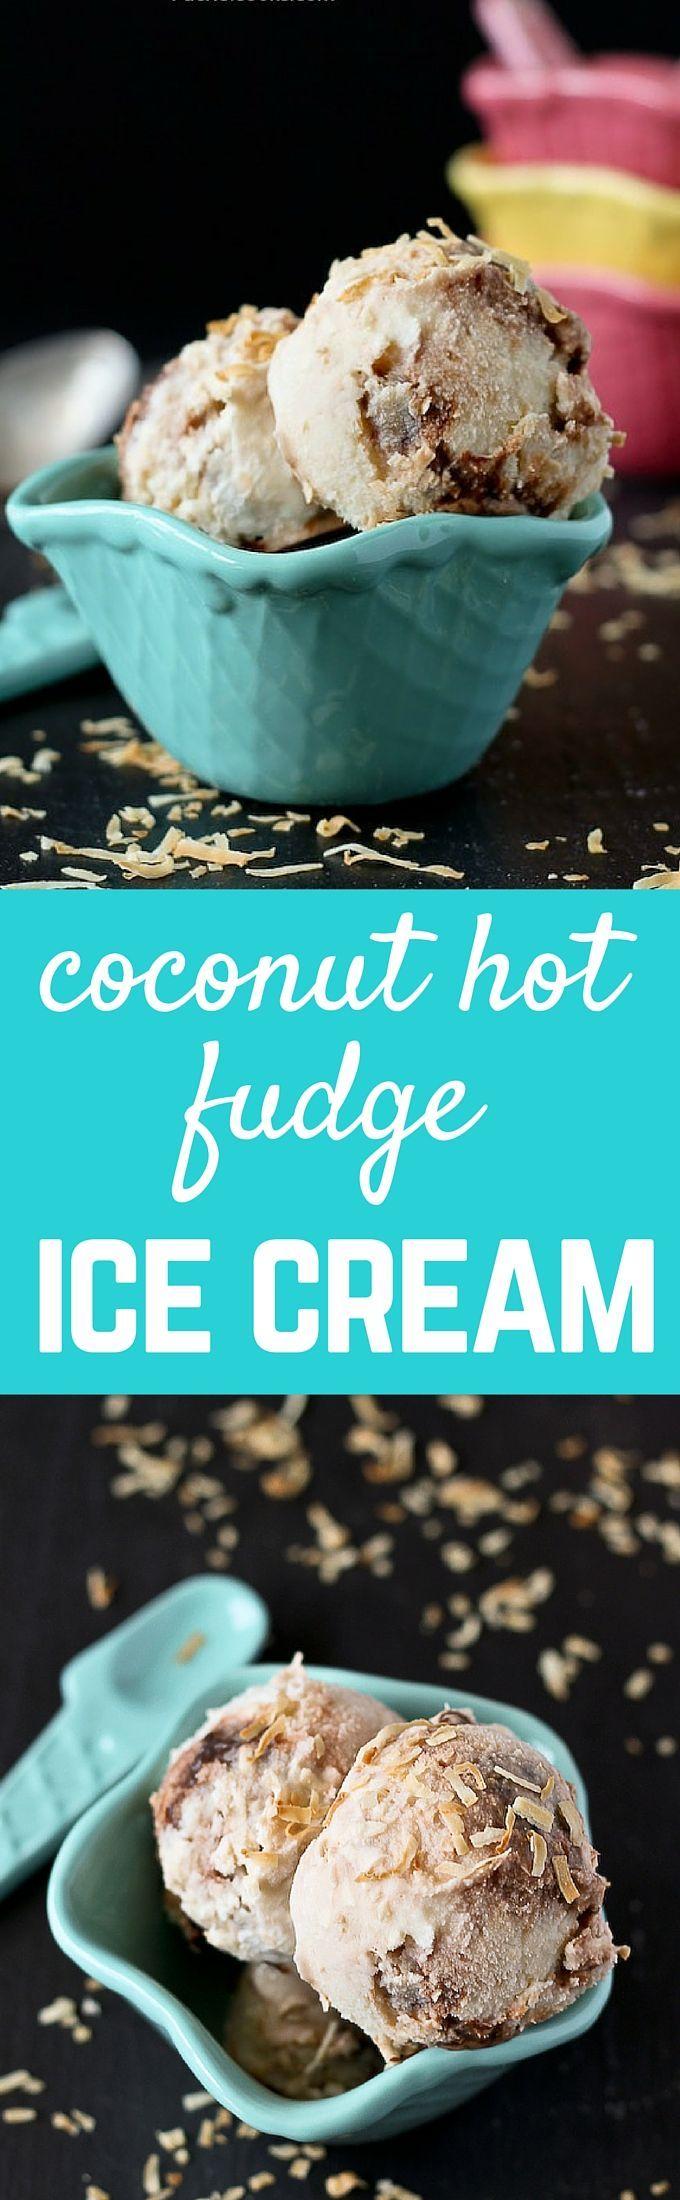 Coconut Hot Fudge Ice Cream - the perfect treat to beat the heat! Get the recipe on http://RachelCooks.com!